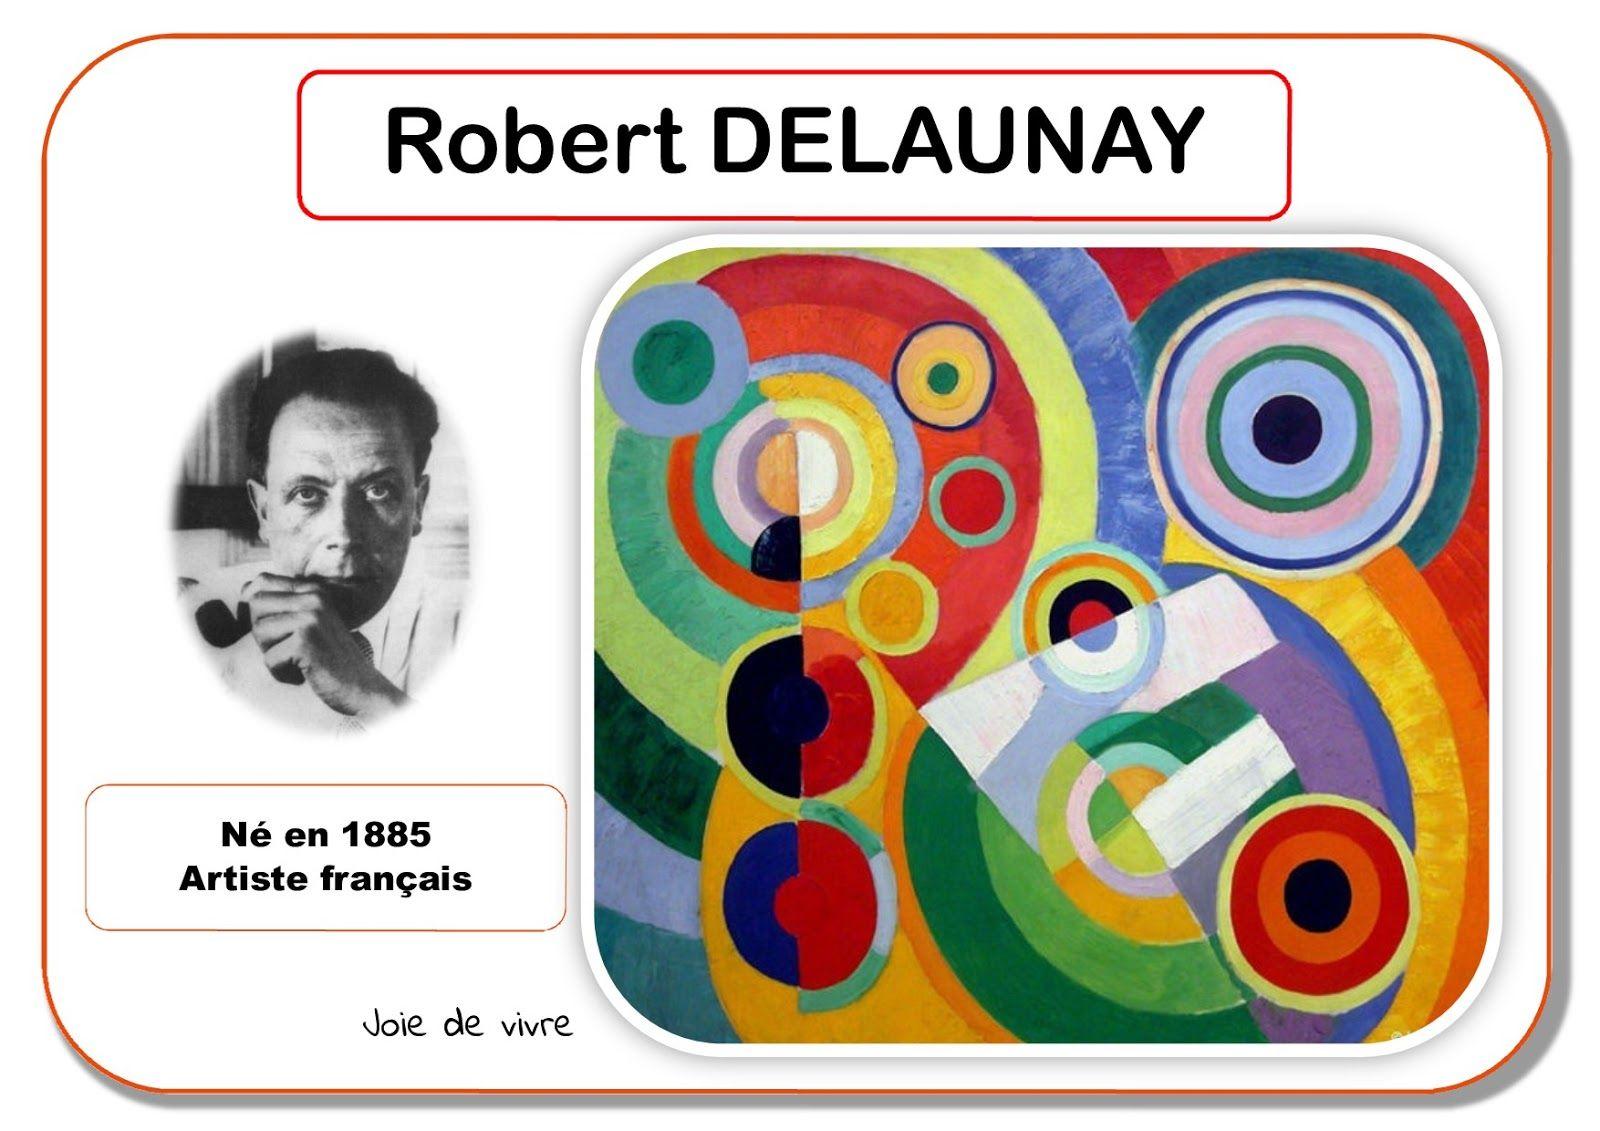 Robert delaunay portrait d 39 artiste artistique pinterest robert delaunay portraits and - Coloriage delaunay ...